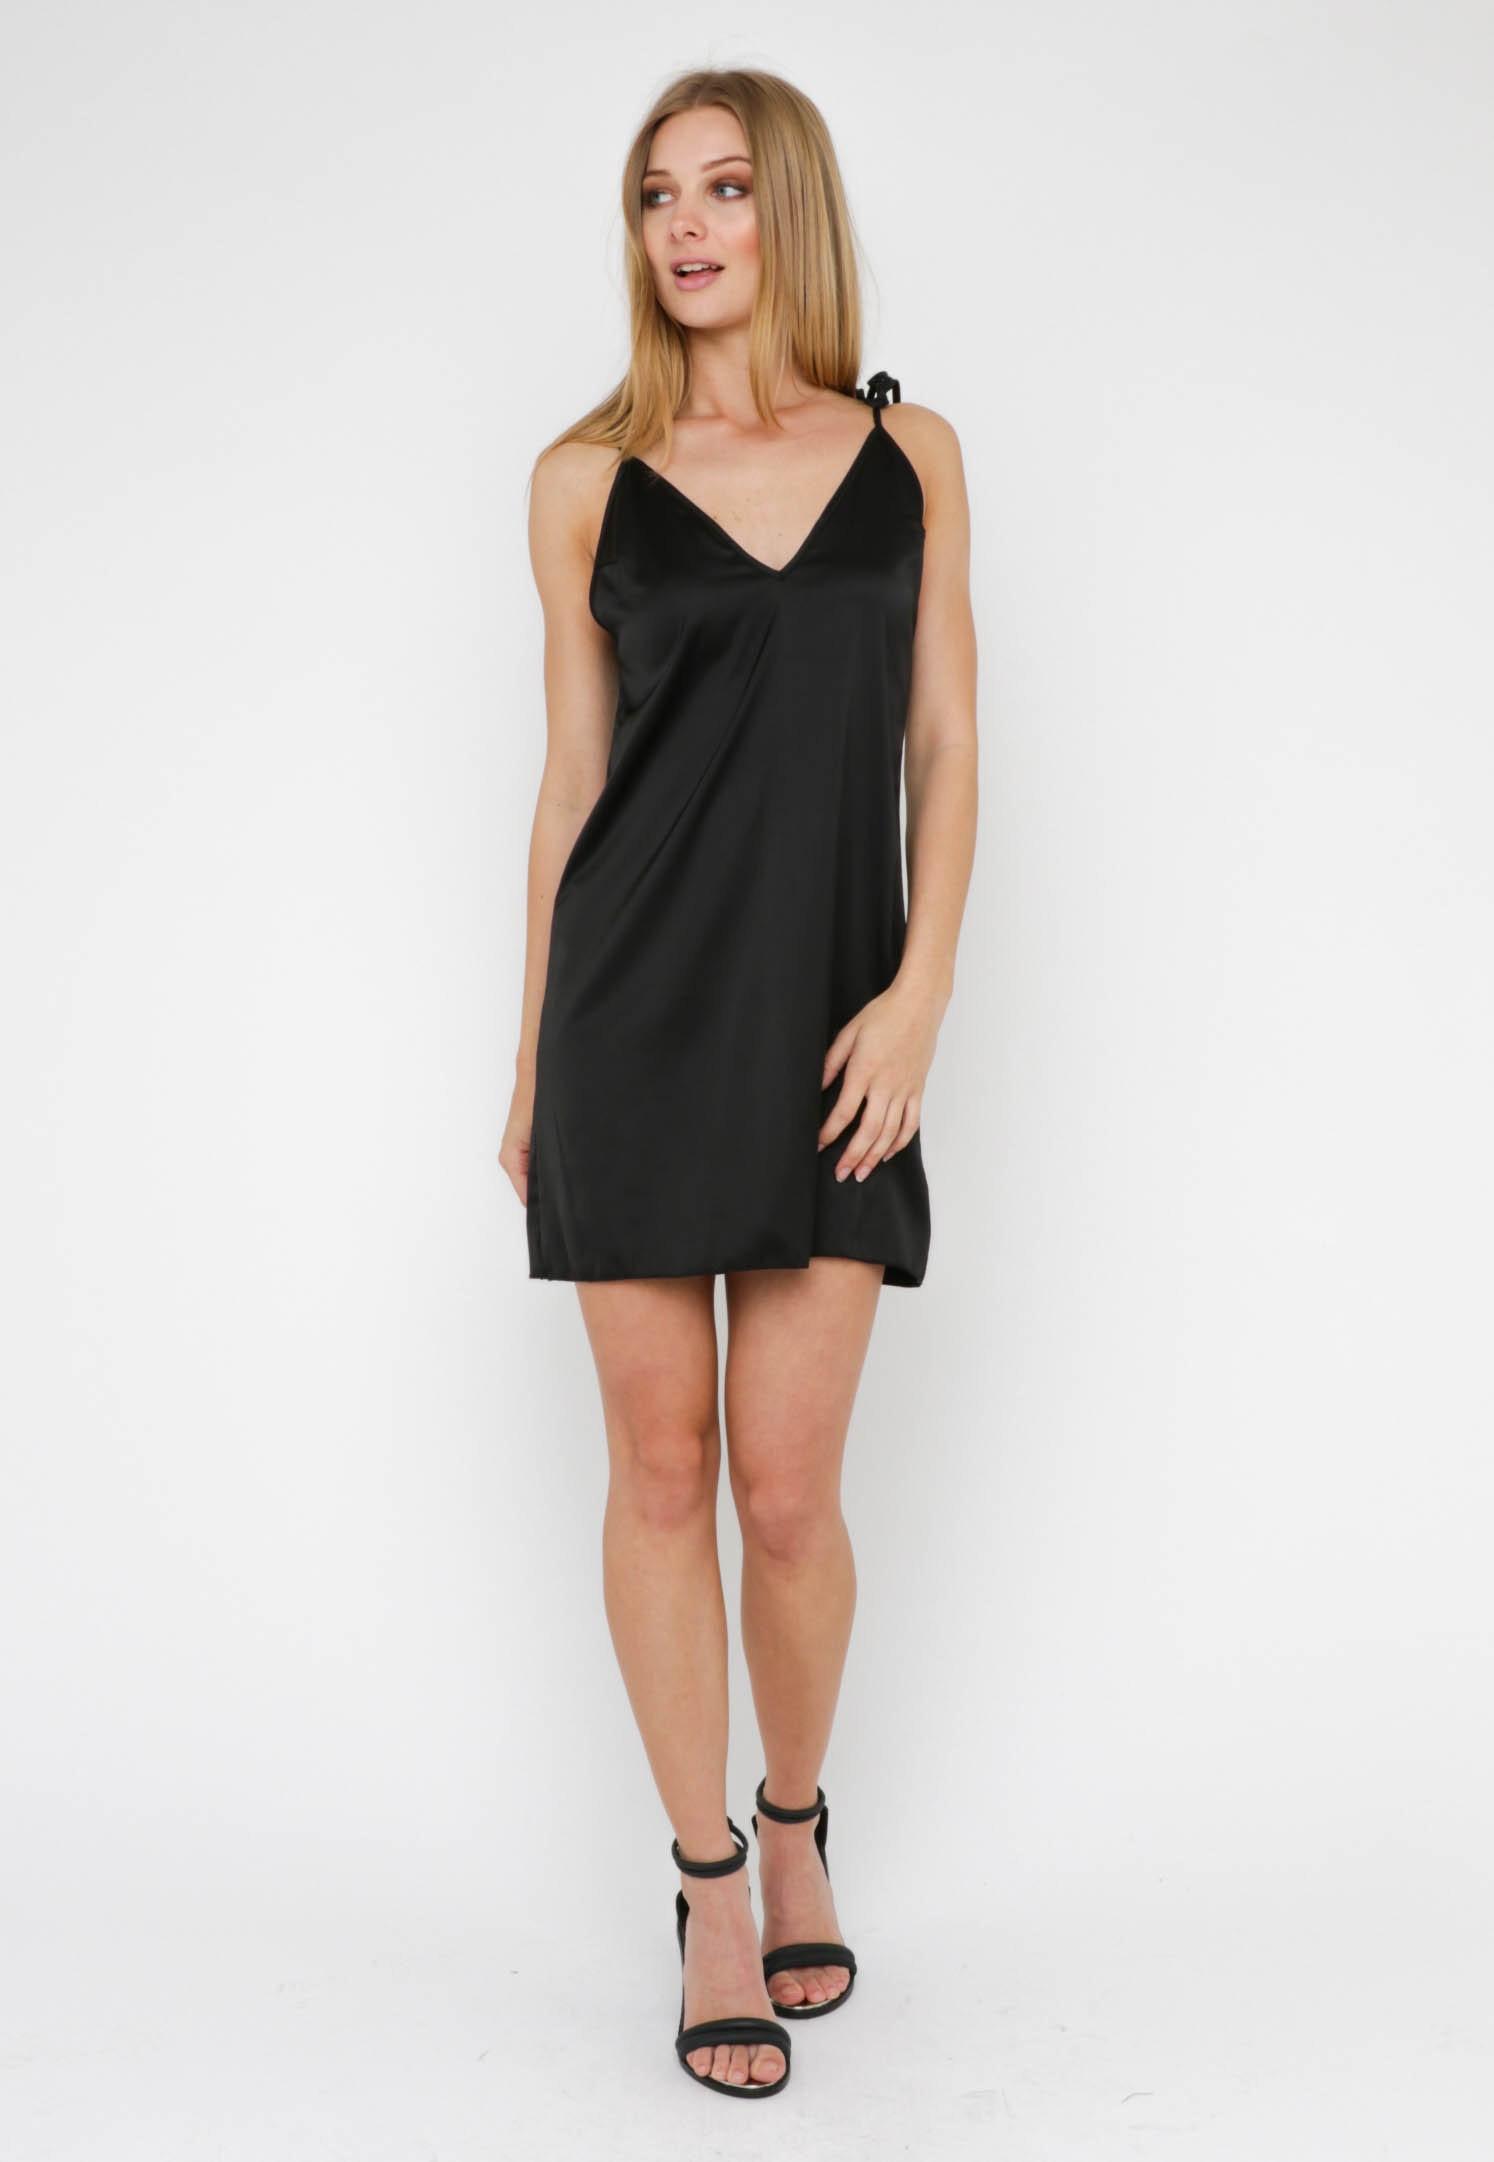 Tie It Up Dress - Black